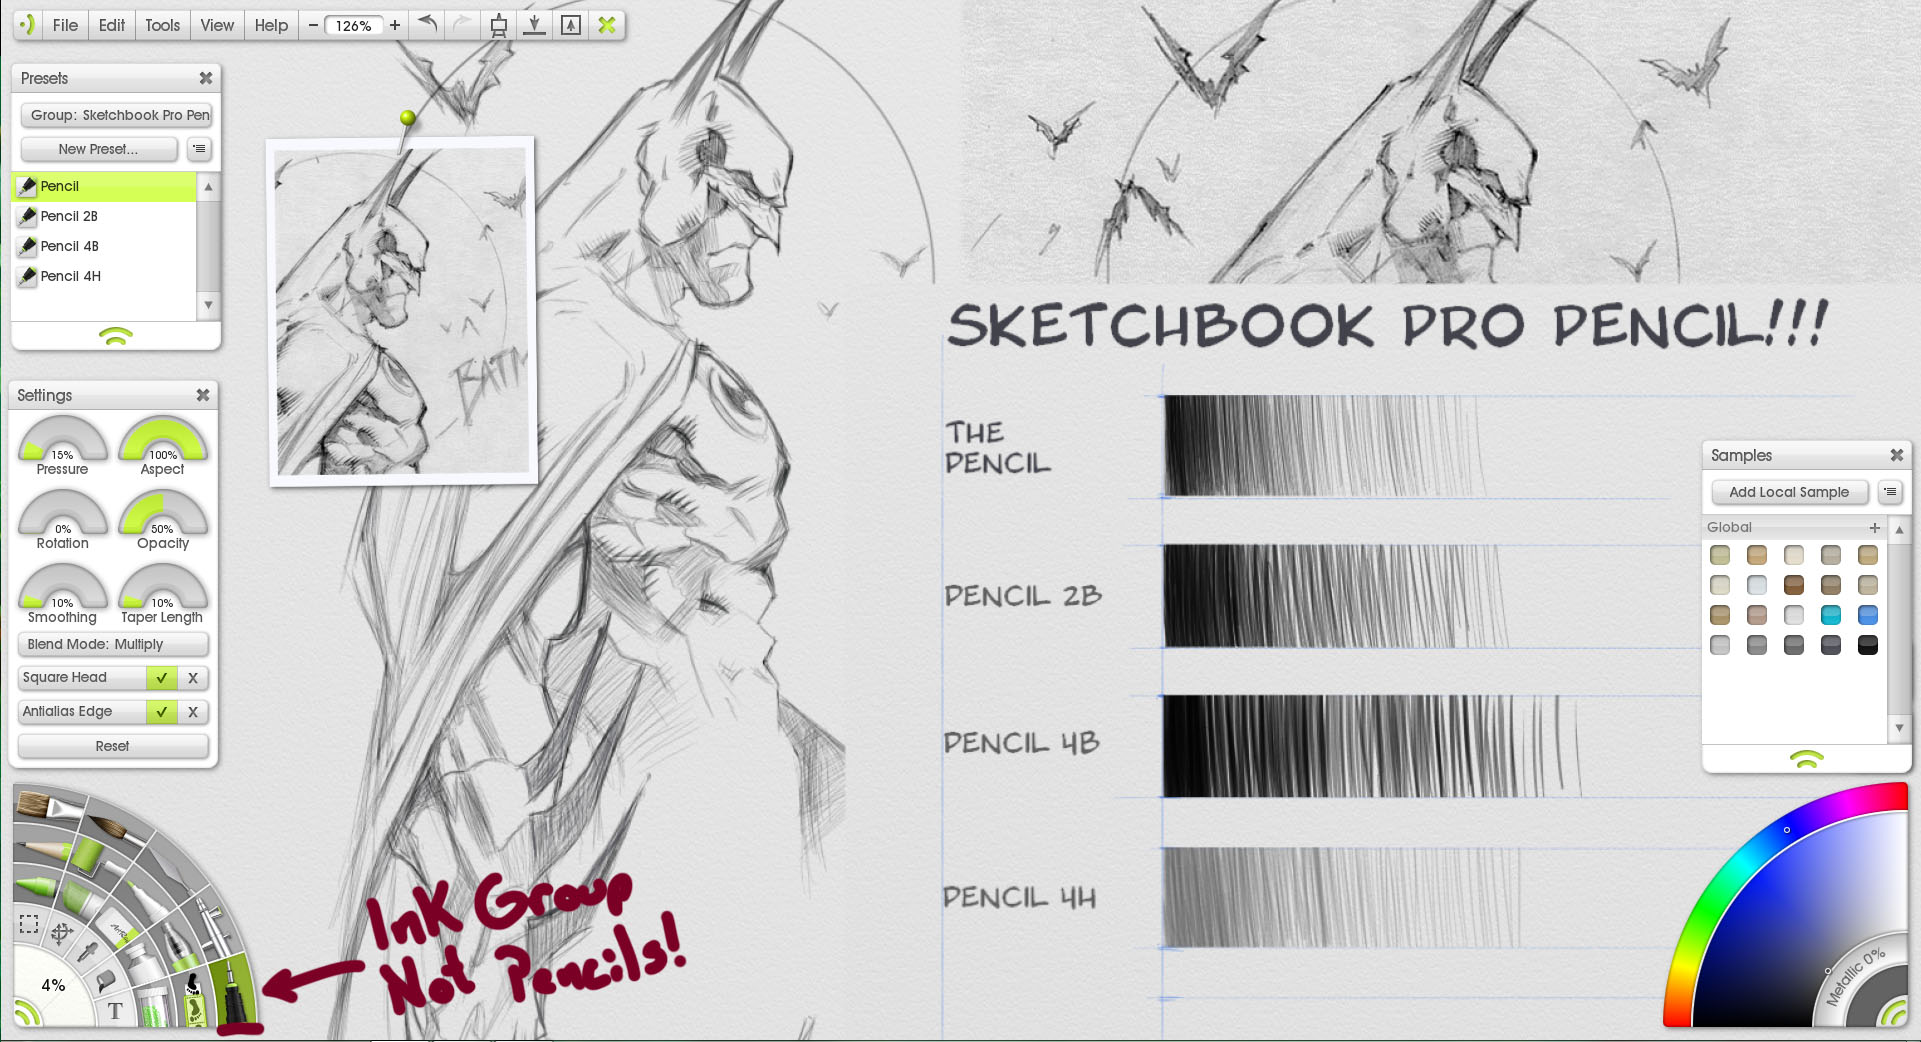 Sketchbook Pro Pencil in Artrage by rad66203 on DeviantArt